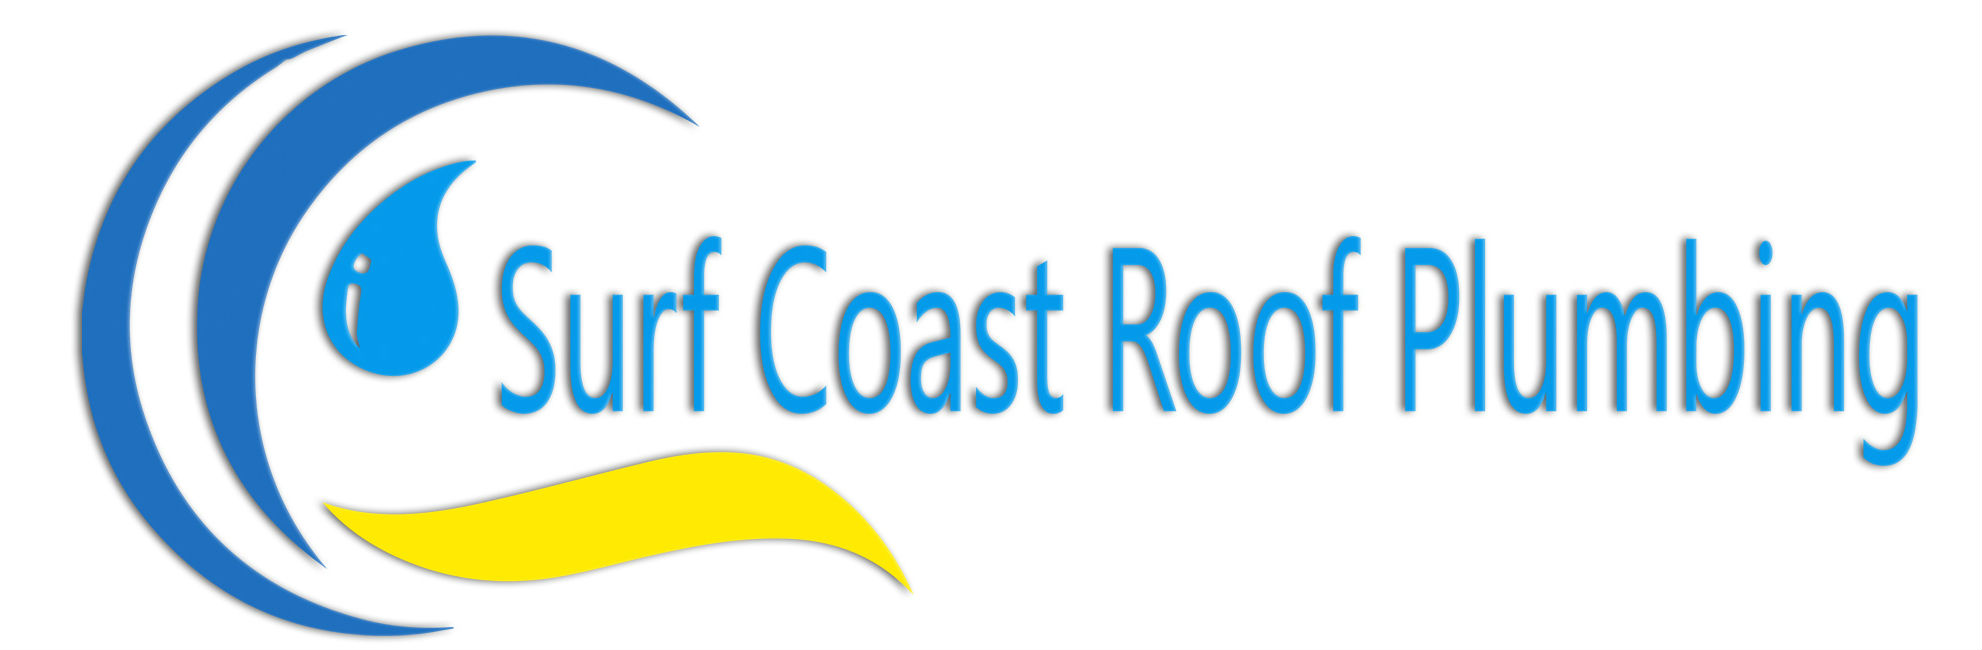 Surf Coast Roof Plumbing